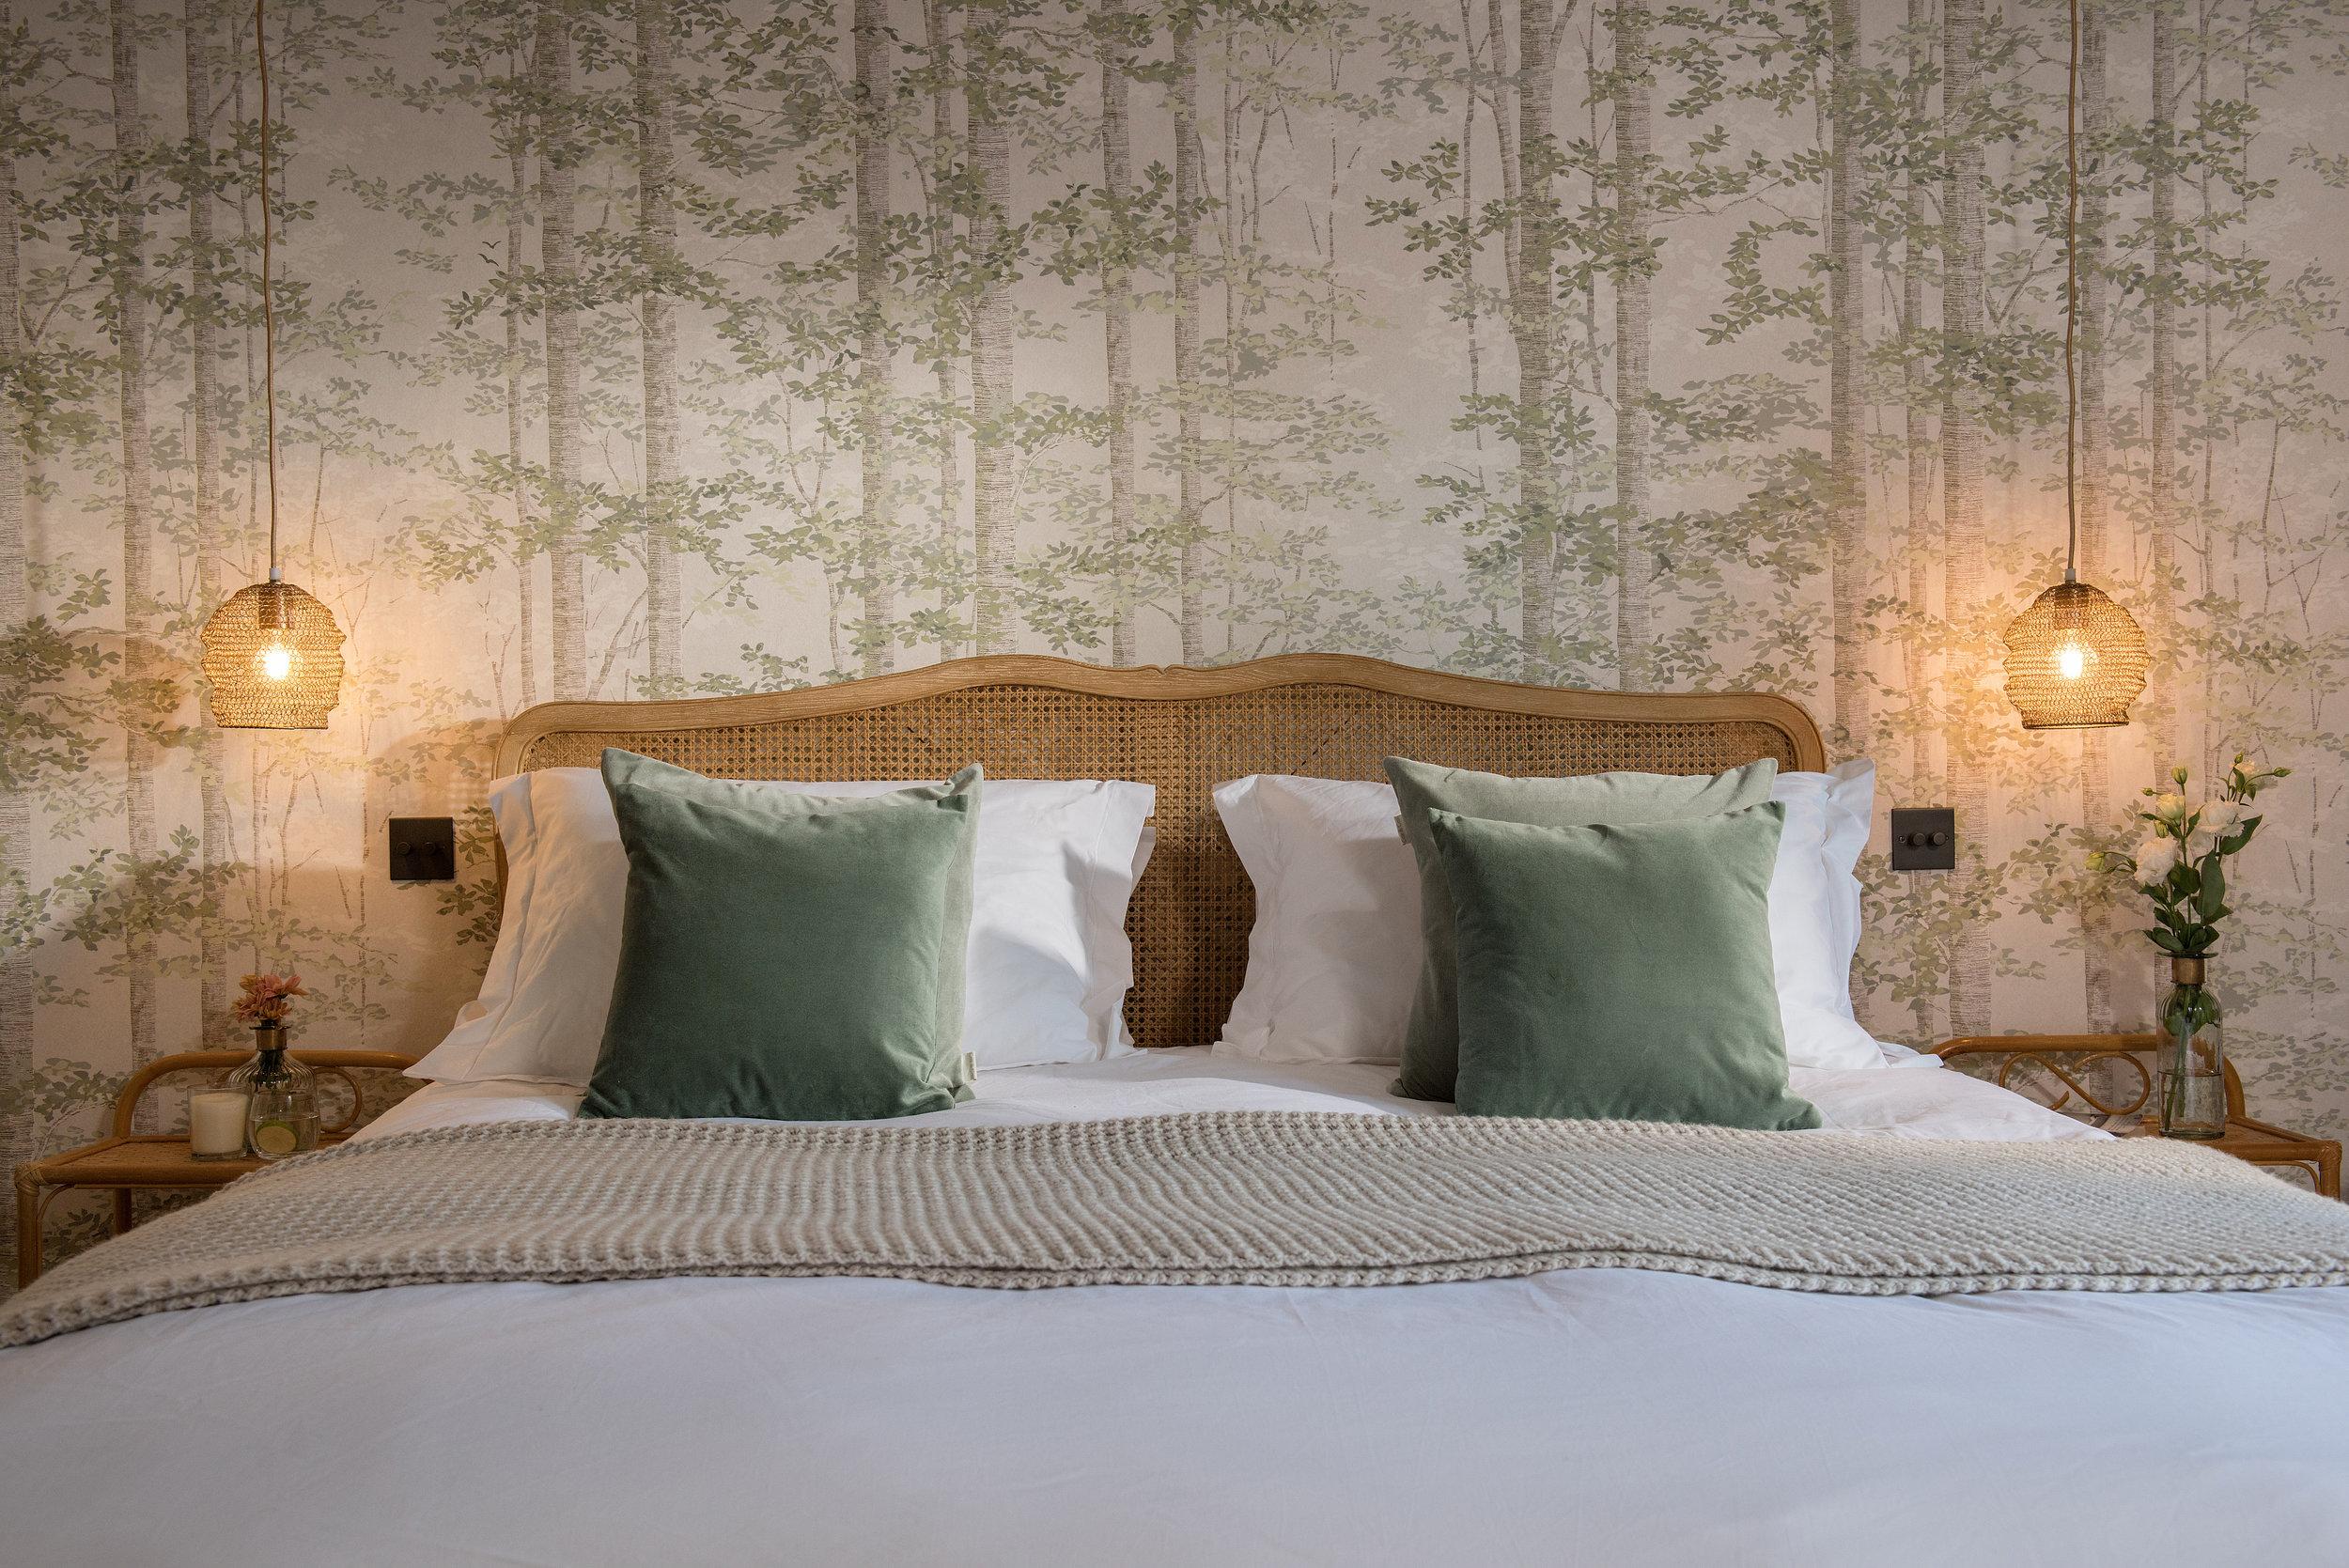 Bedroom 2 - spacious & calming